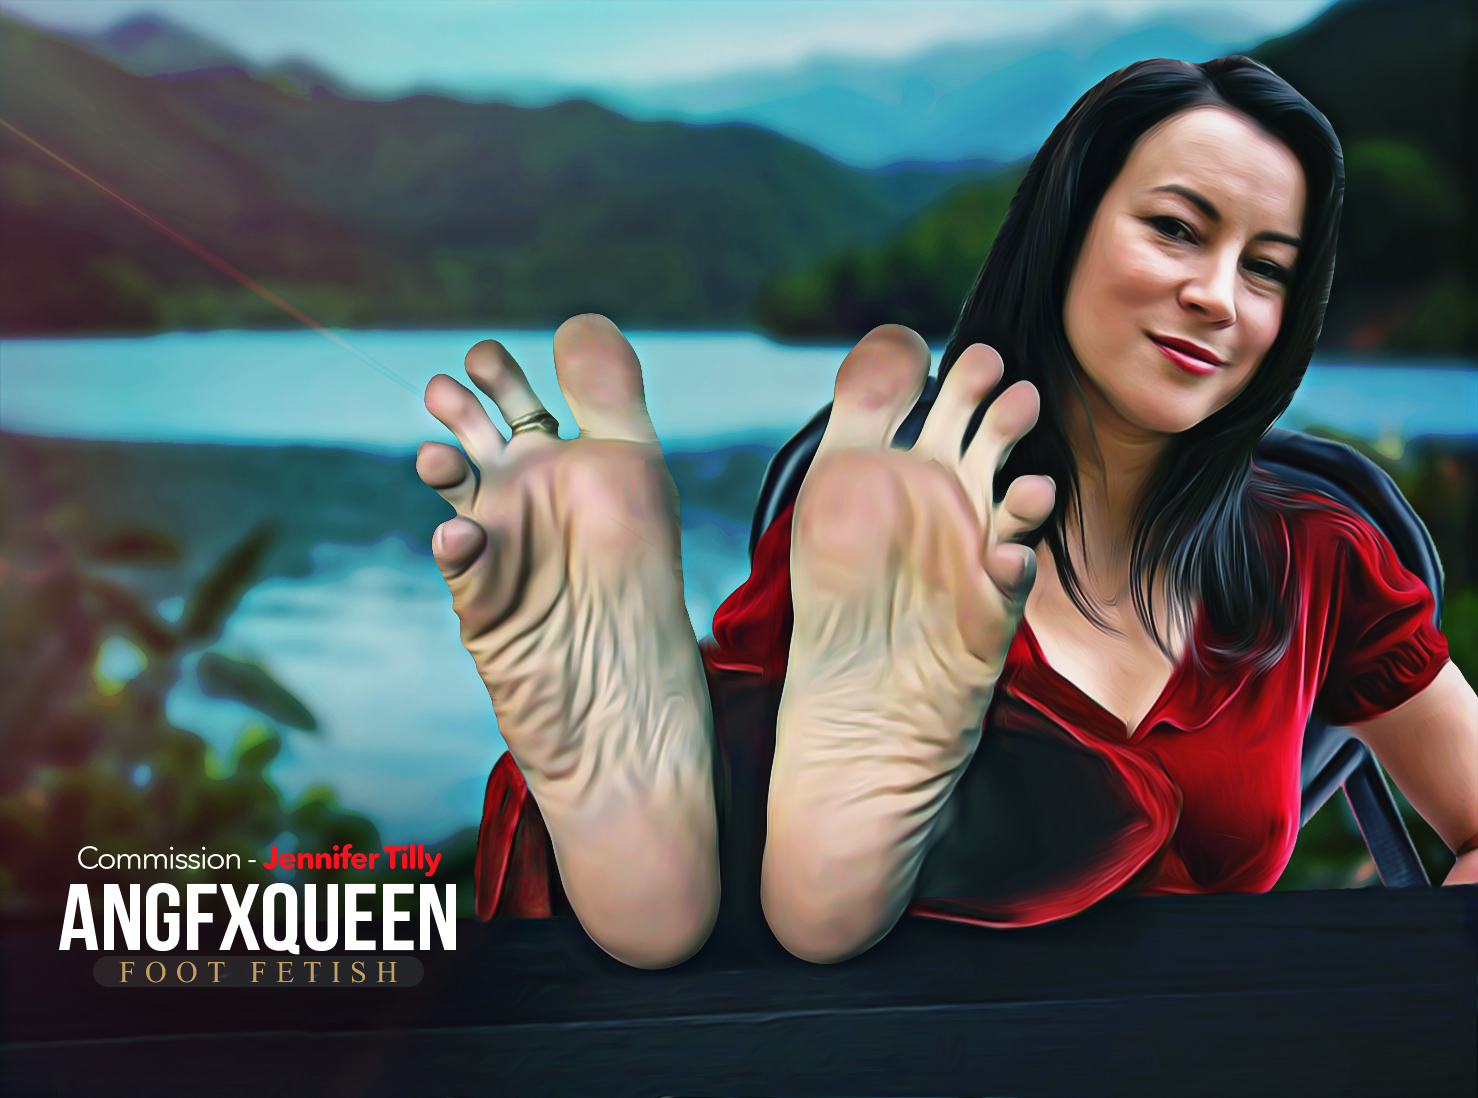 Foot fetish commission